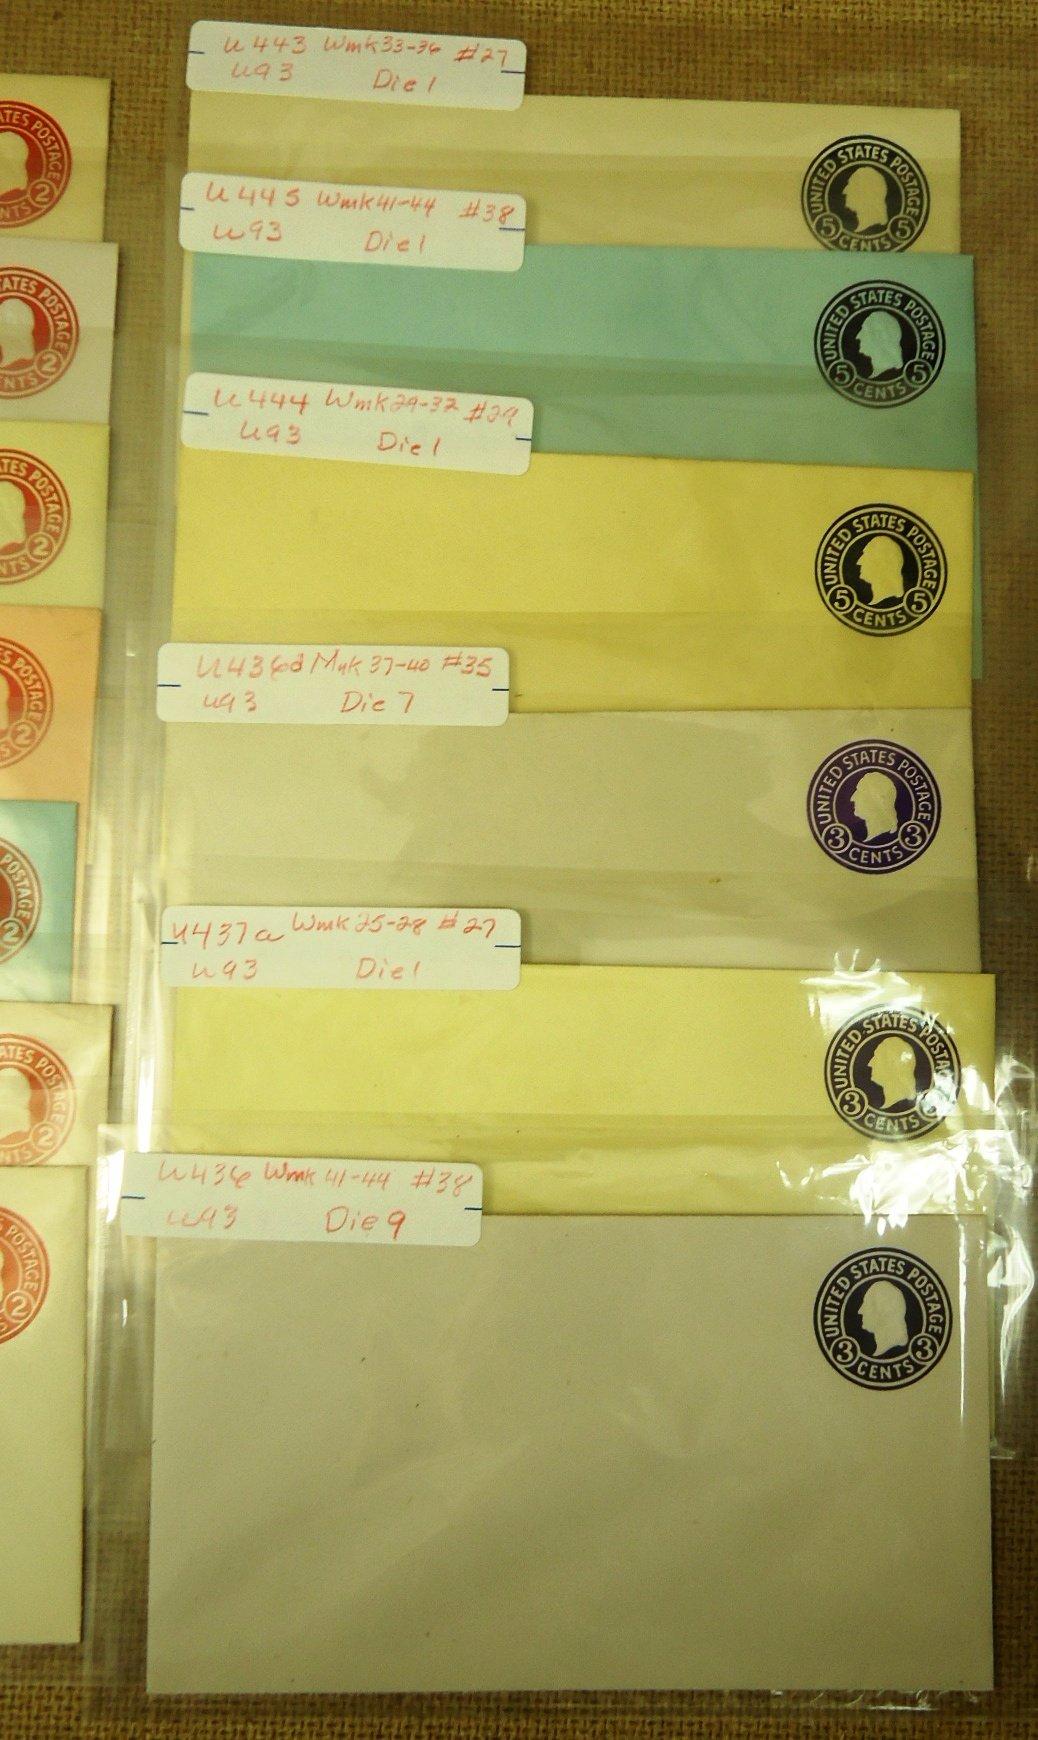 USPS Scott U420 U421 U423 U424 U429 U430 U431 U432 U436 U437 U444 More Envelopes